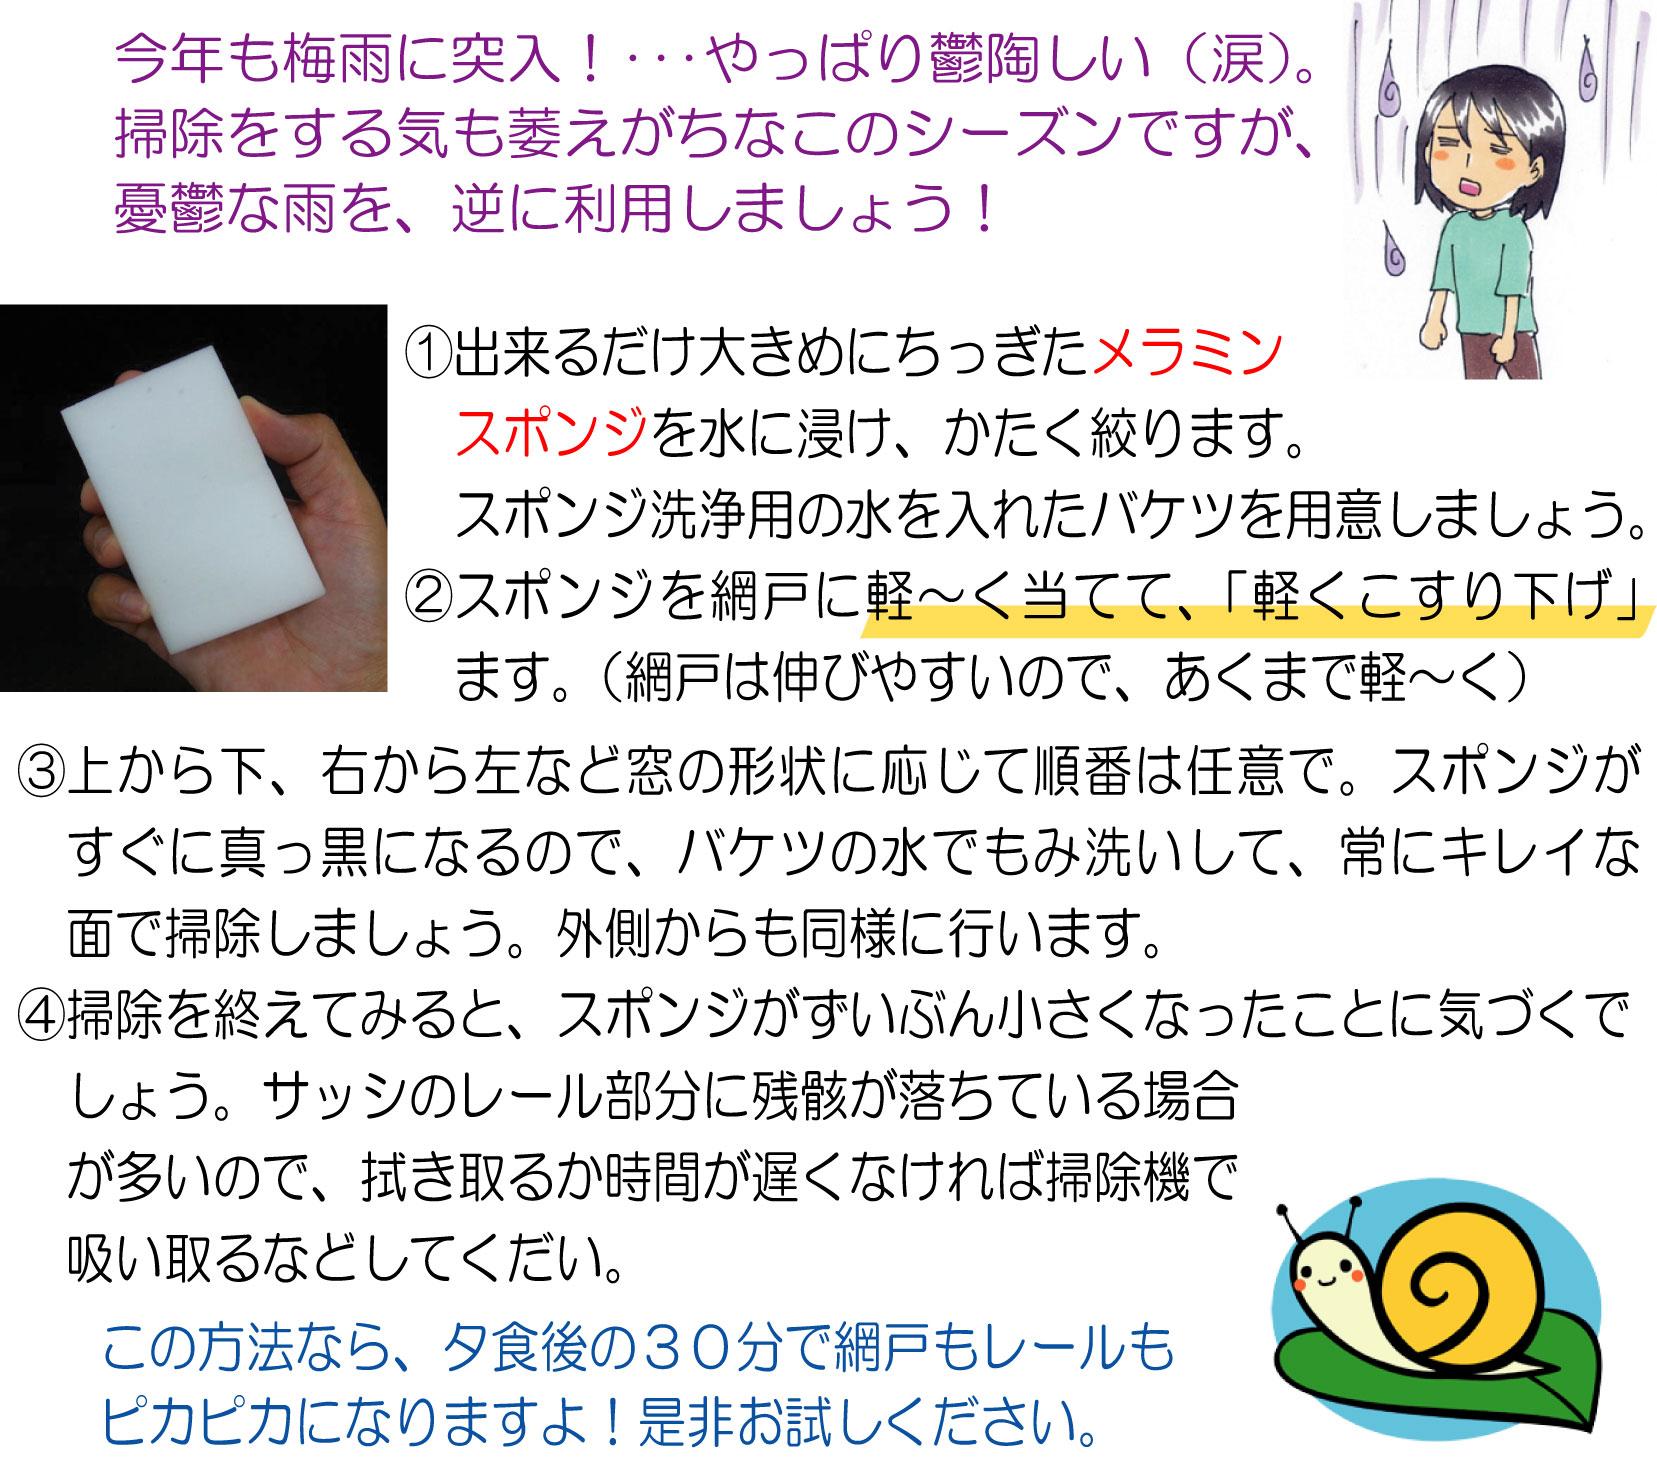 KuraSi-natu-sin73-12.jpg